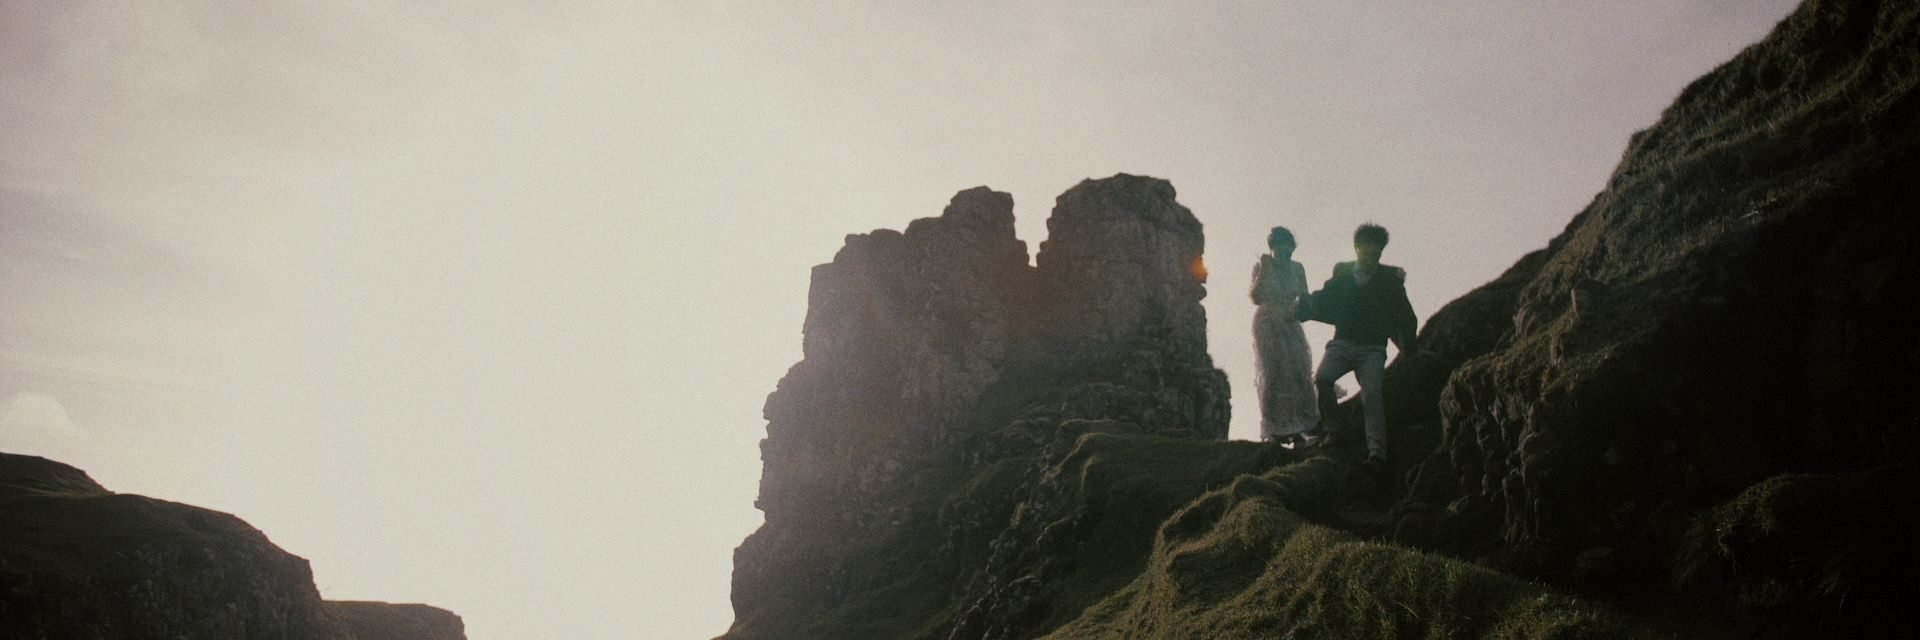 Isle of Skye-elopement-videographer-cinemate-films-04